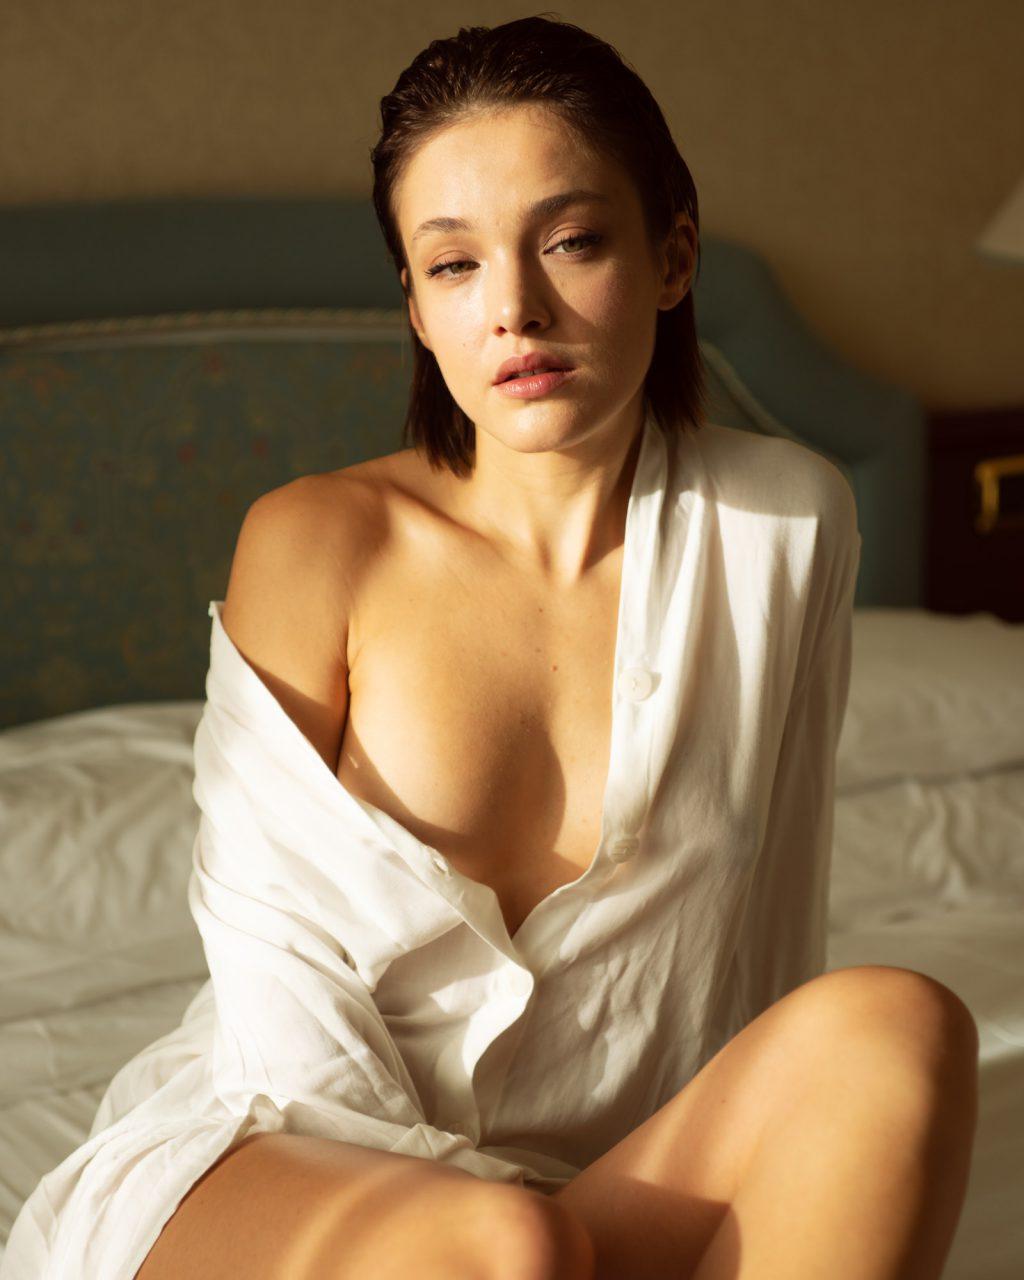 olga_shutieva_by_eugenio_qose_02